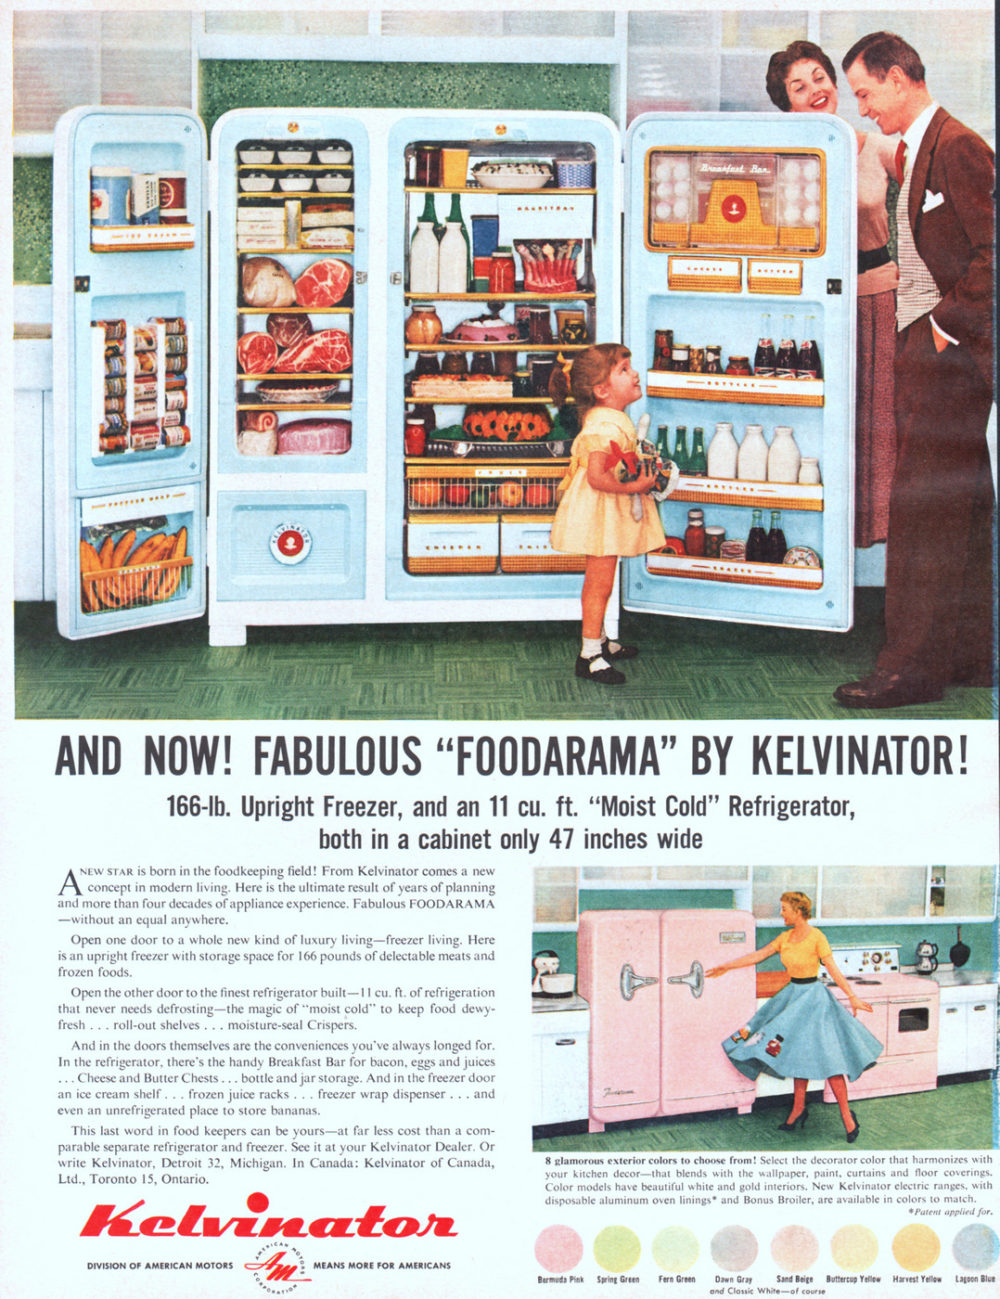 01 Kelvinator Moist Cold Refrigerator